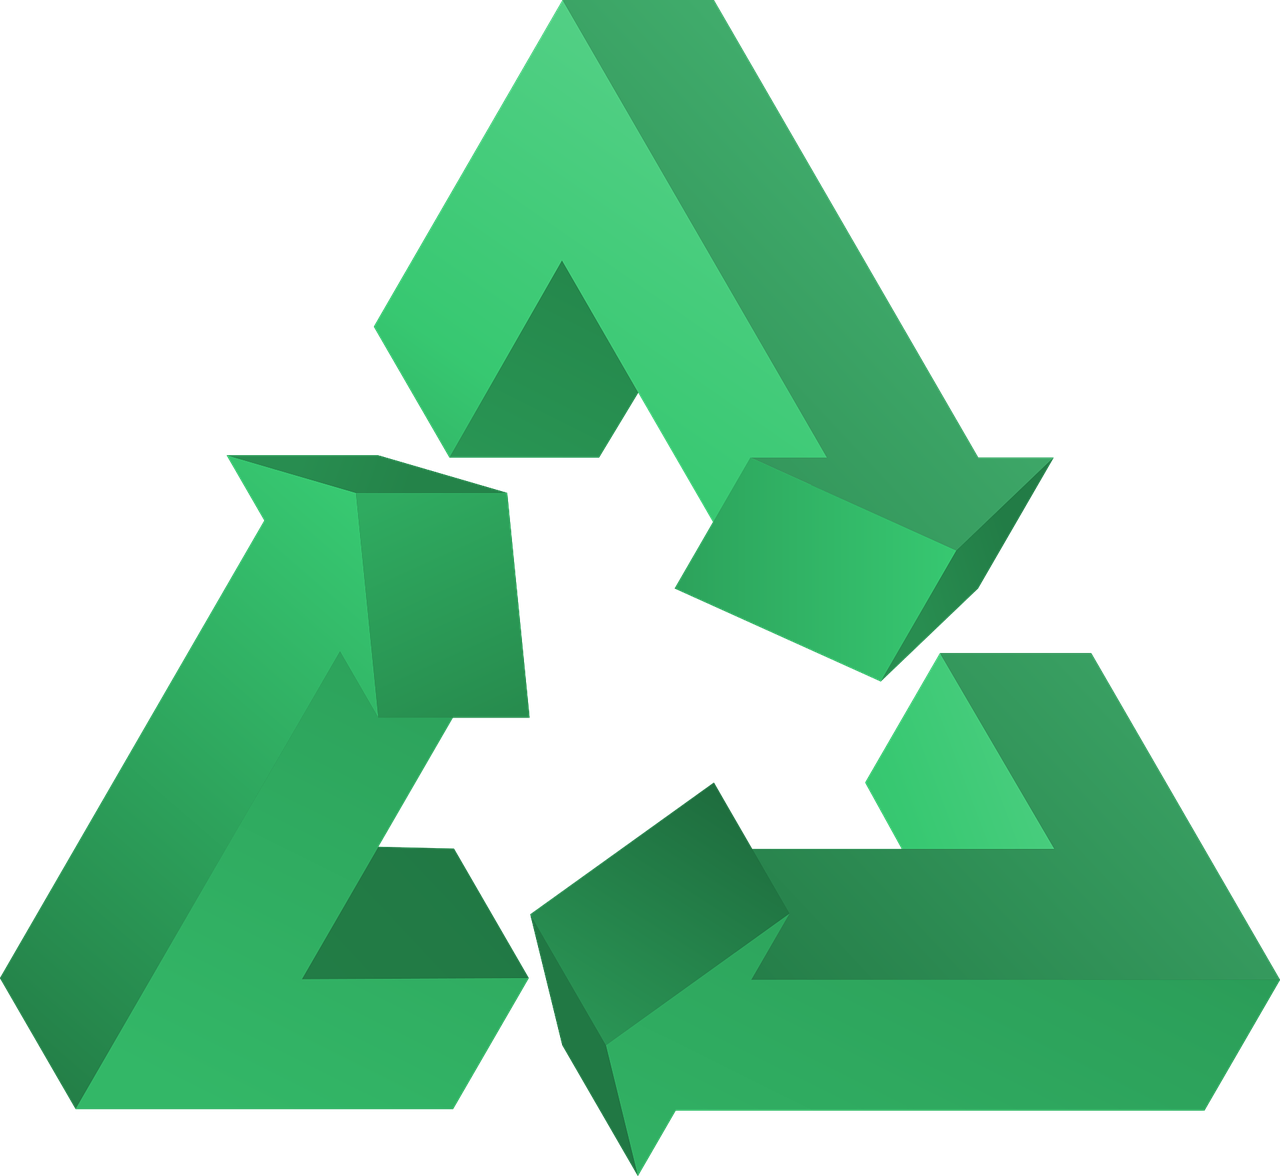 symbole du recyclage